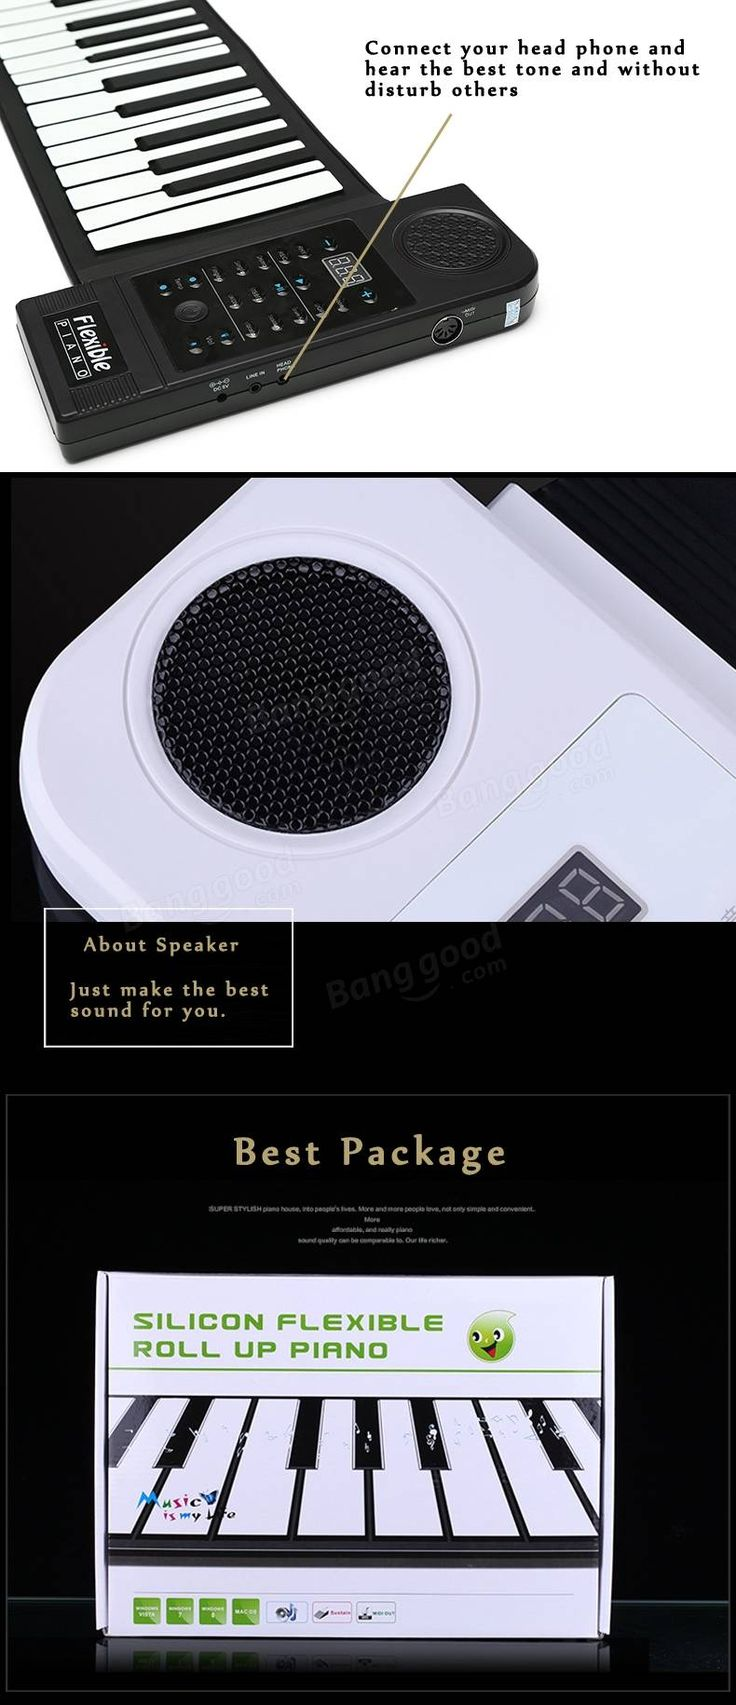 KONIX PN61S 61 Key Silicone Portable Roll Up Piano MIDI Keyboard Sale…